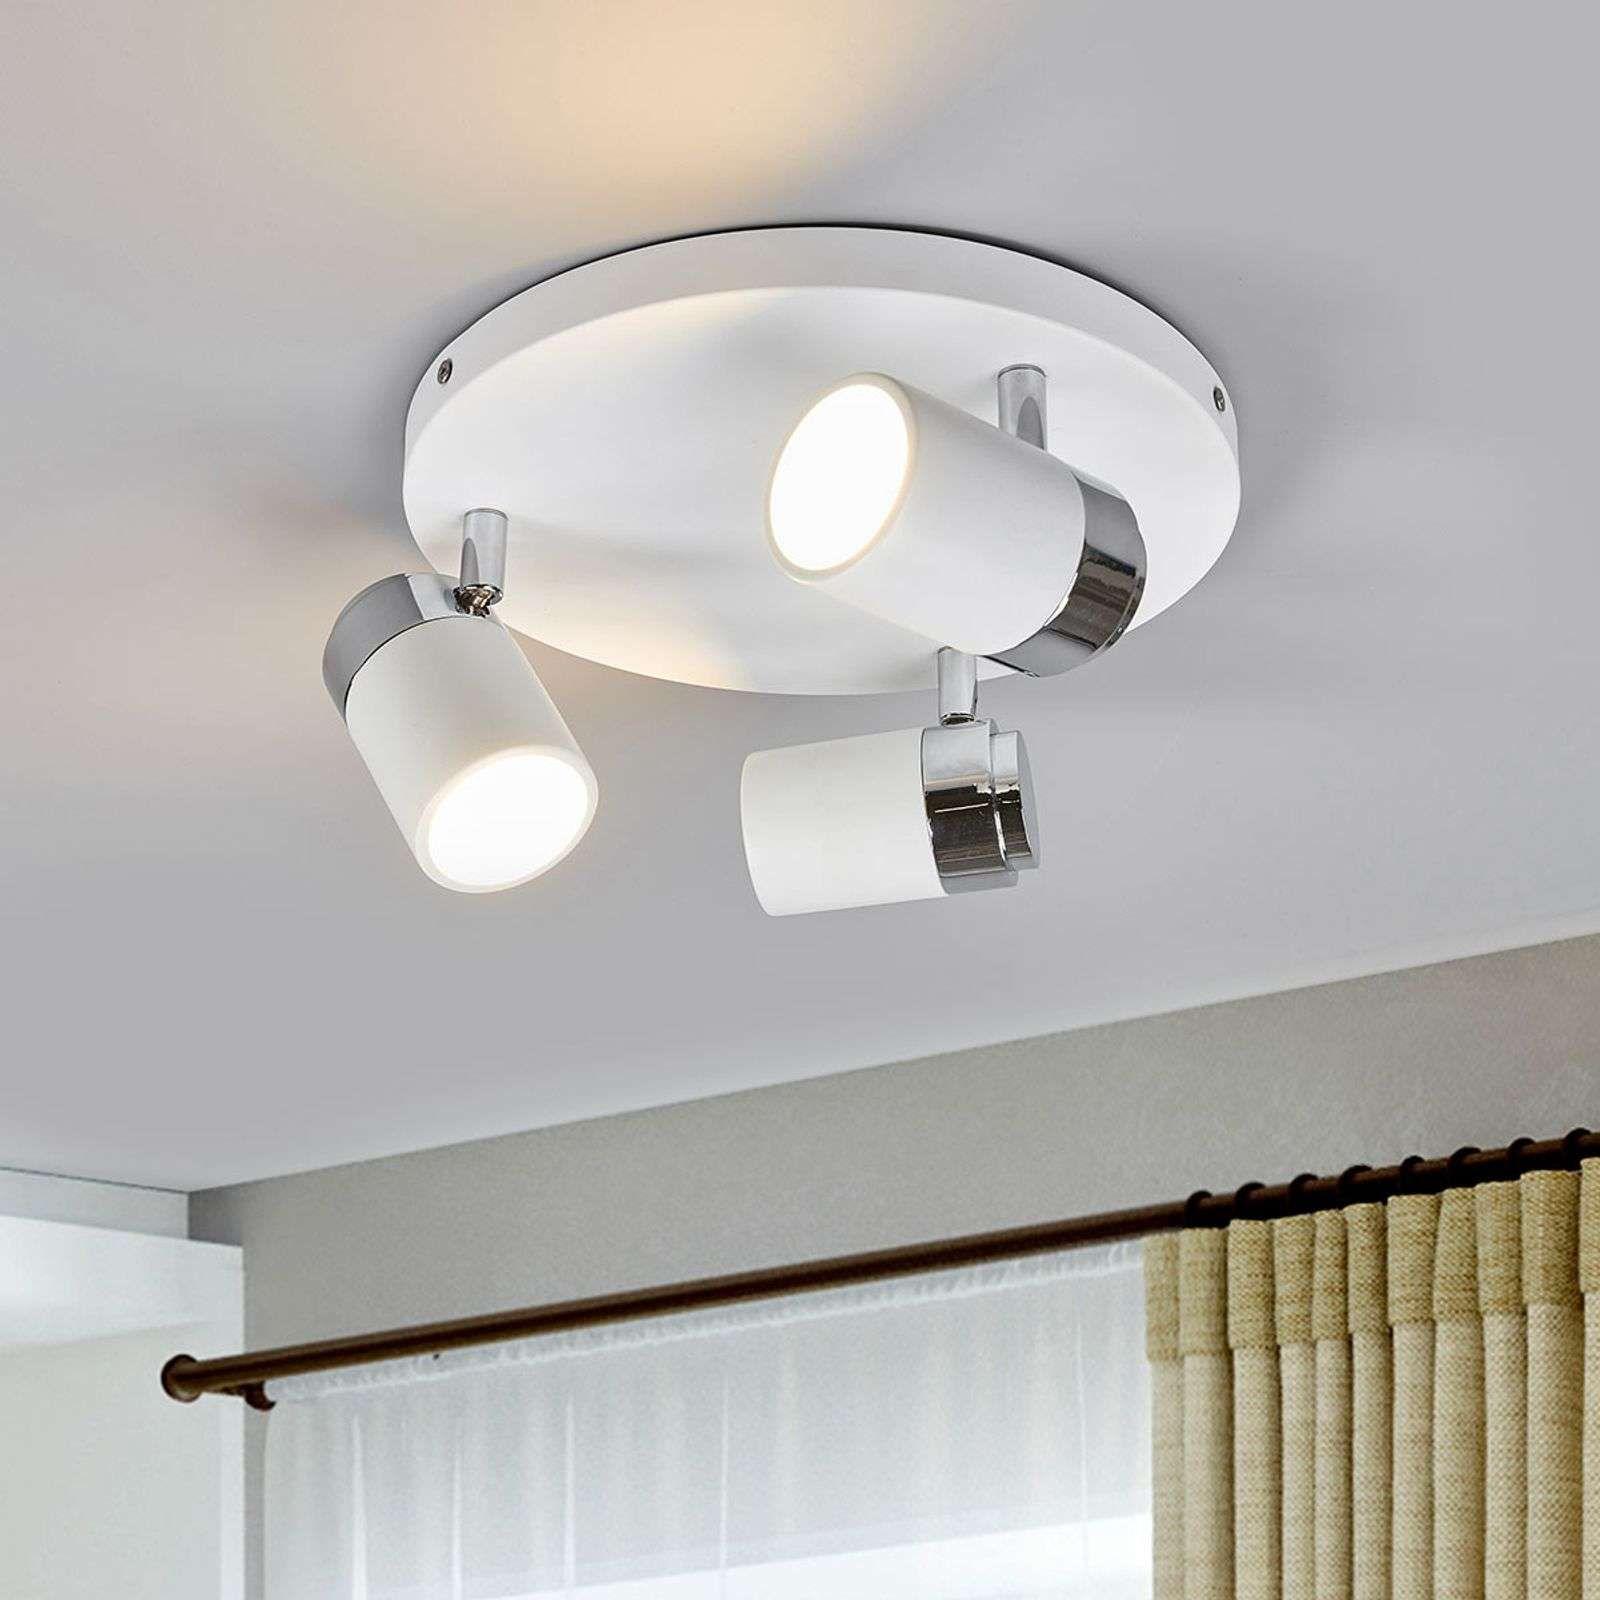 Kardo Badkamer Plafondlamp In Wit En Chroom Plafondlamp Badkamer Plafondlamp Badkamerlamp